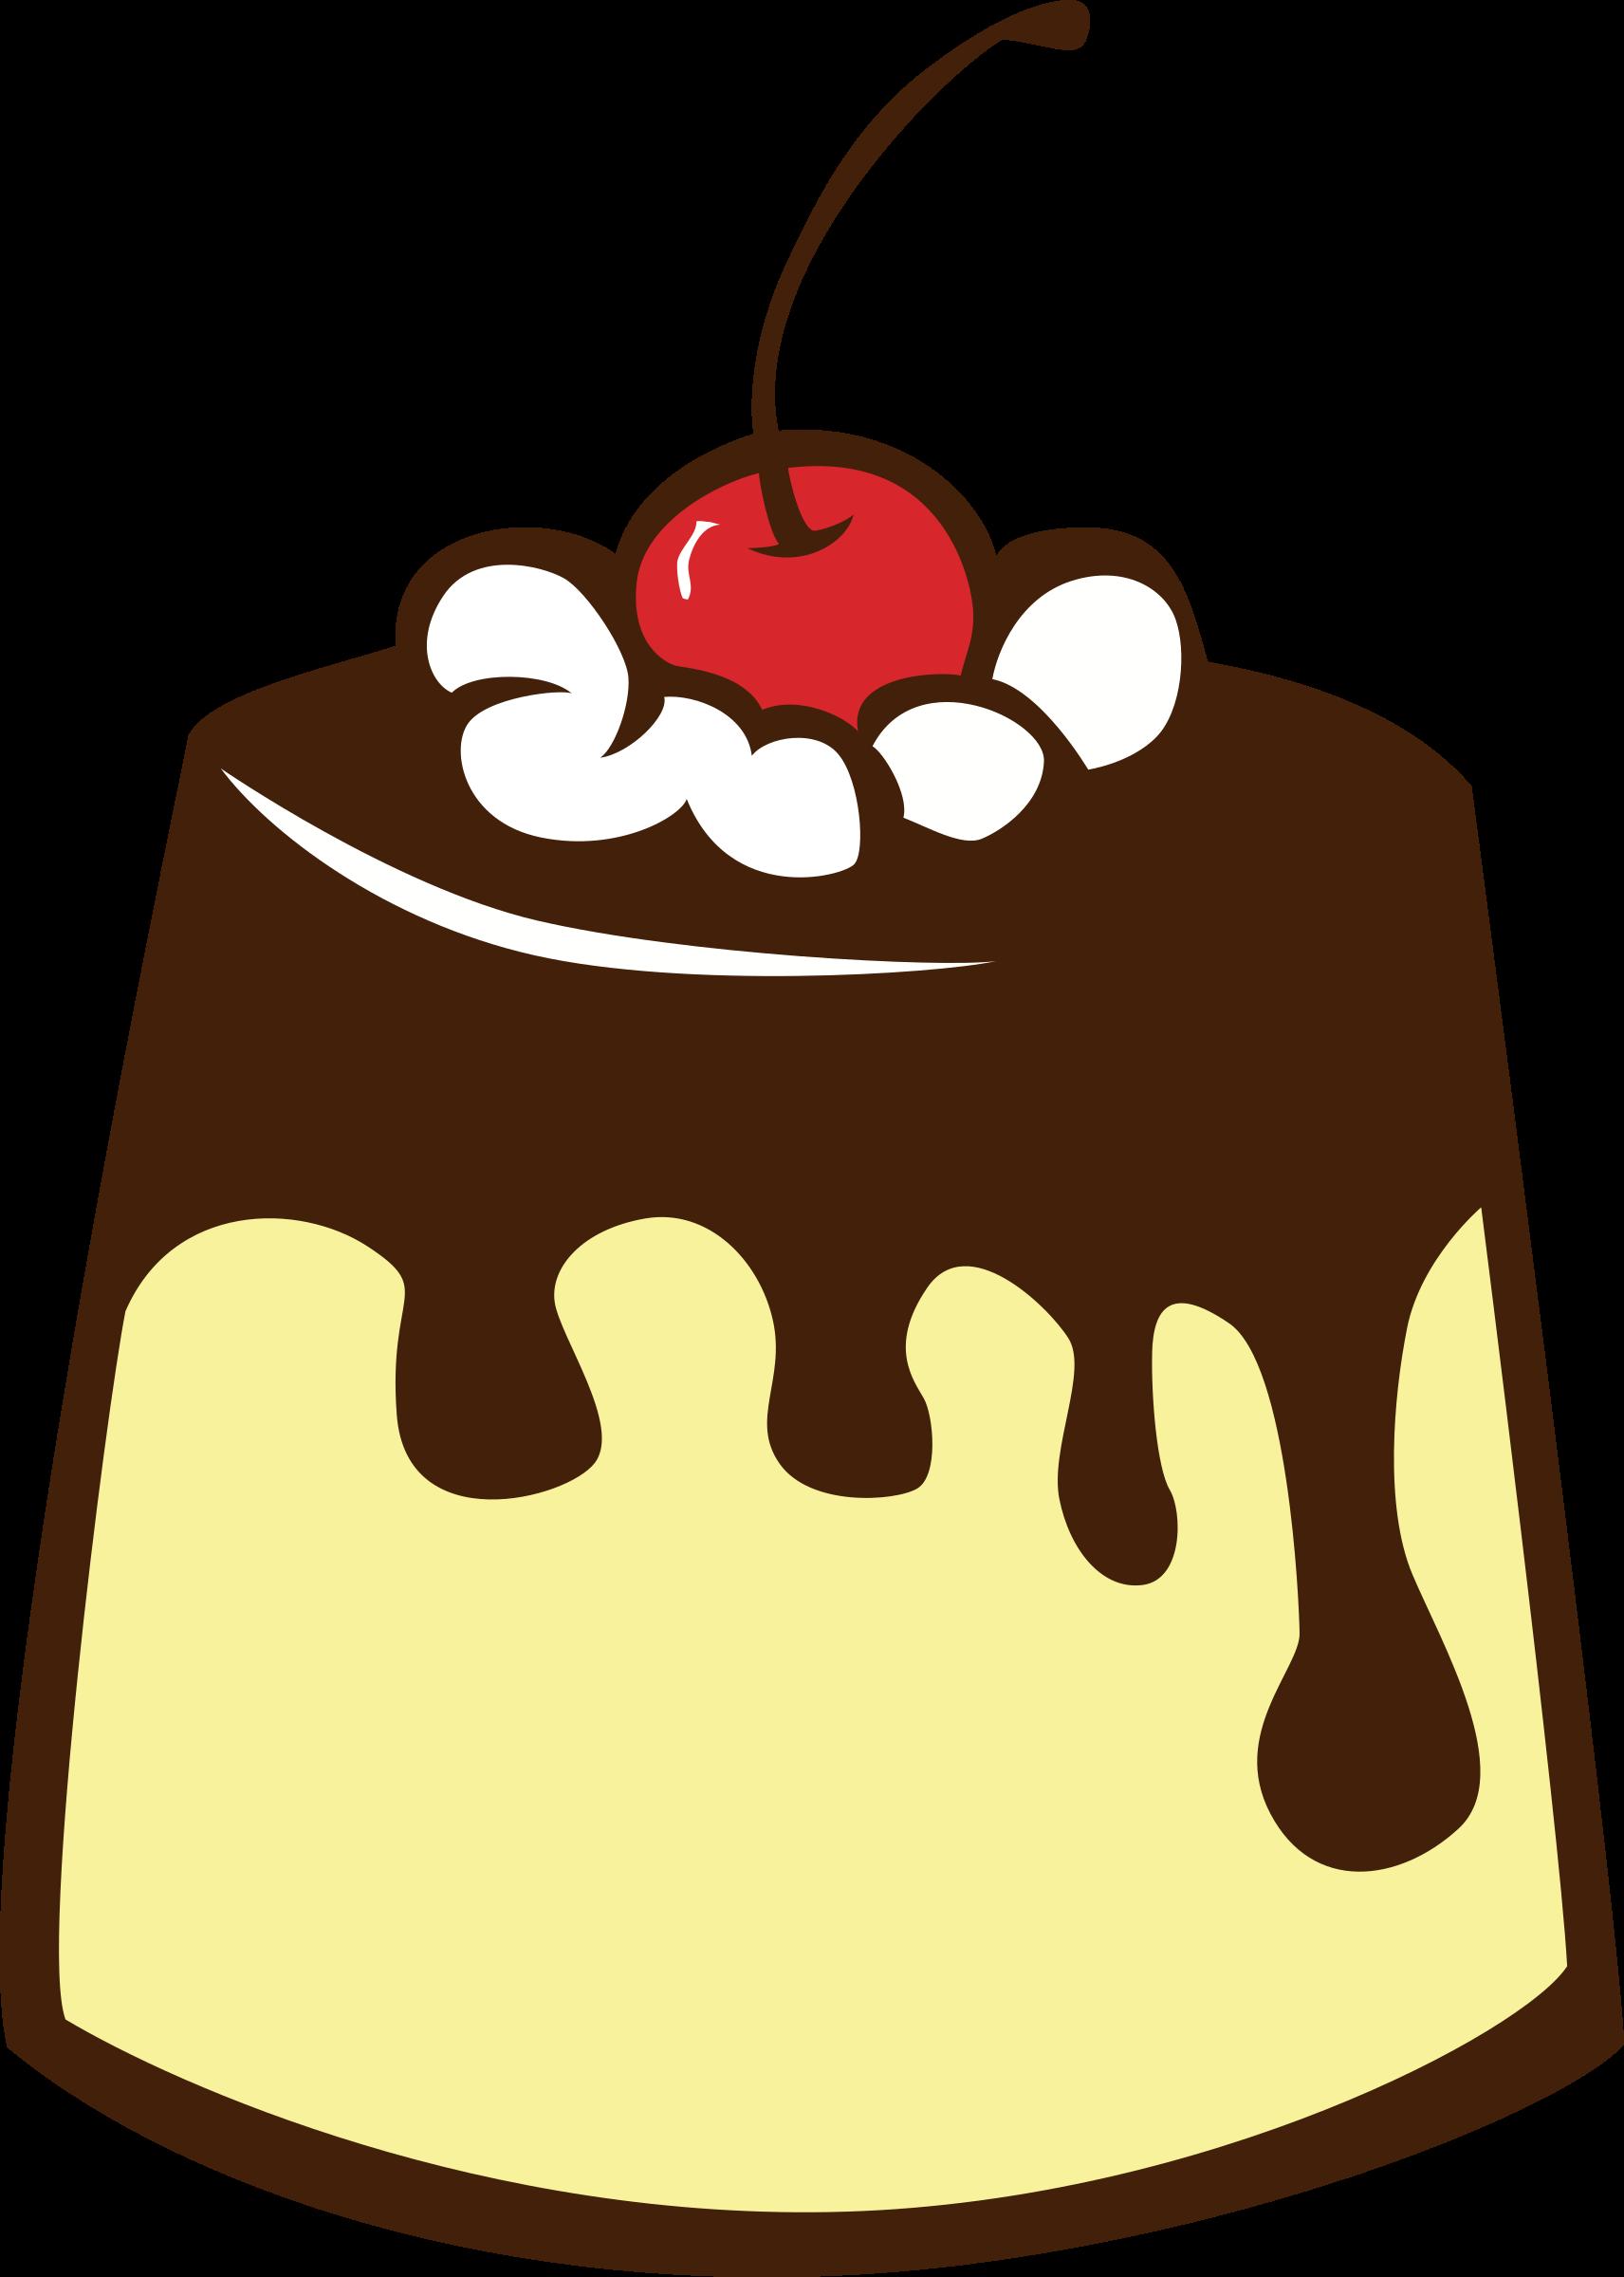 desserts clipart pudding